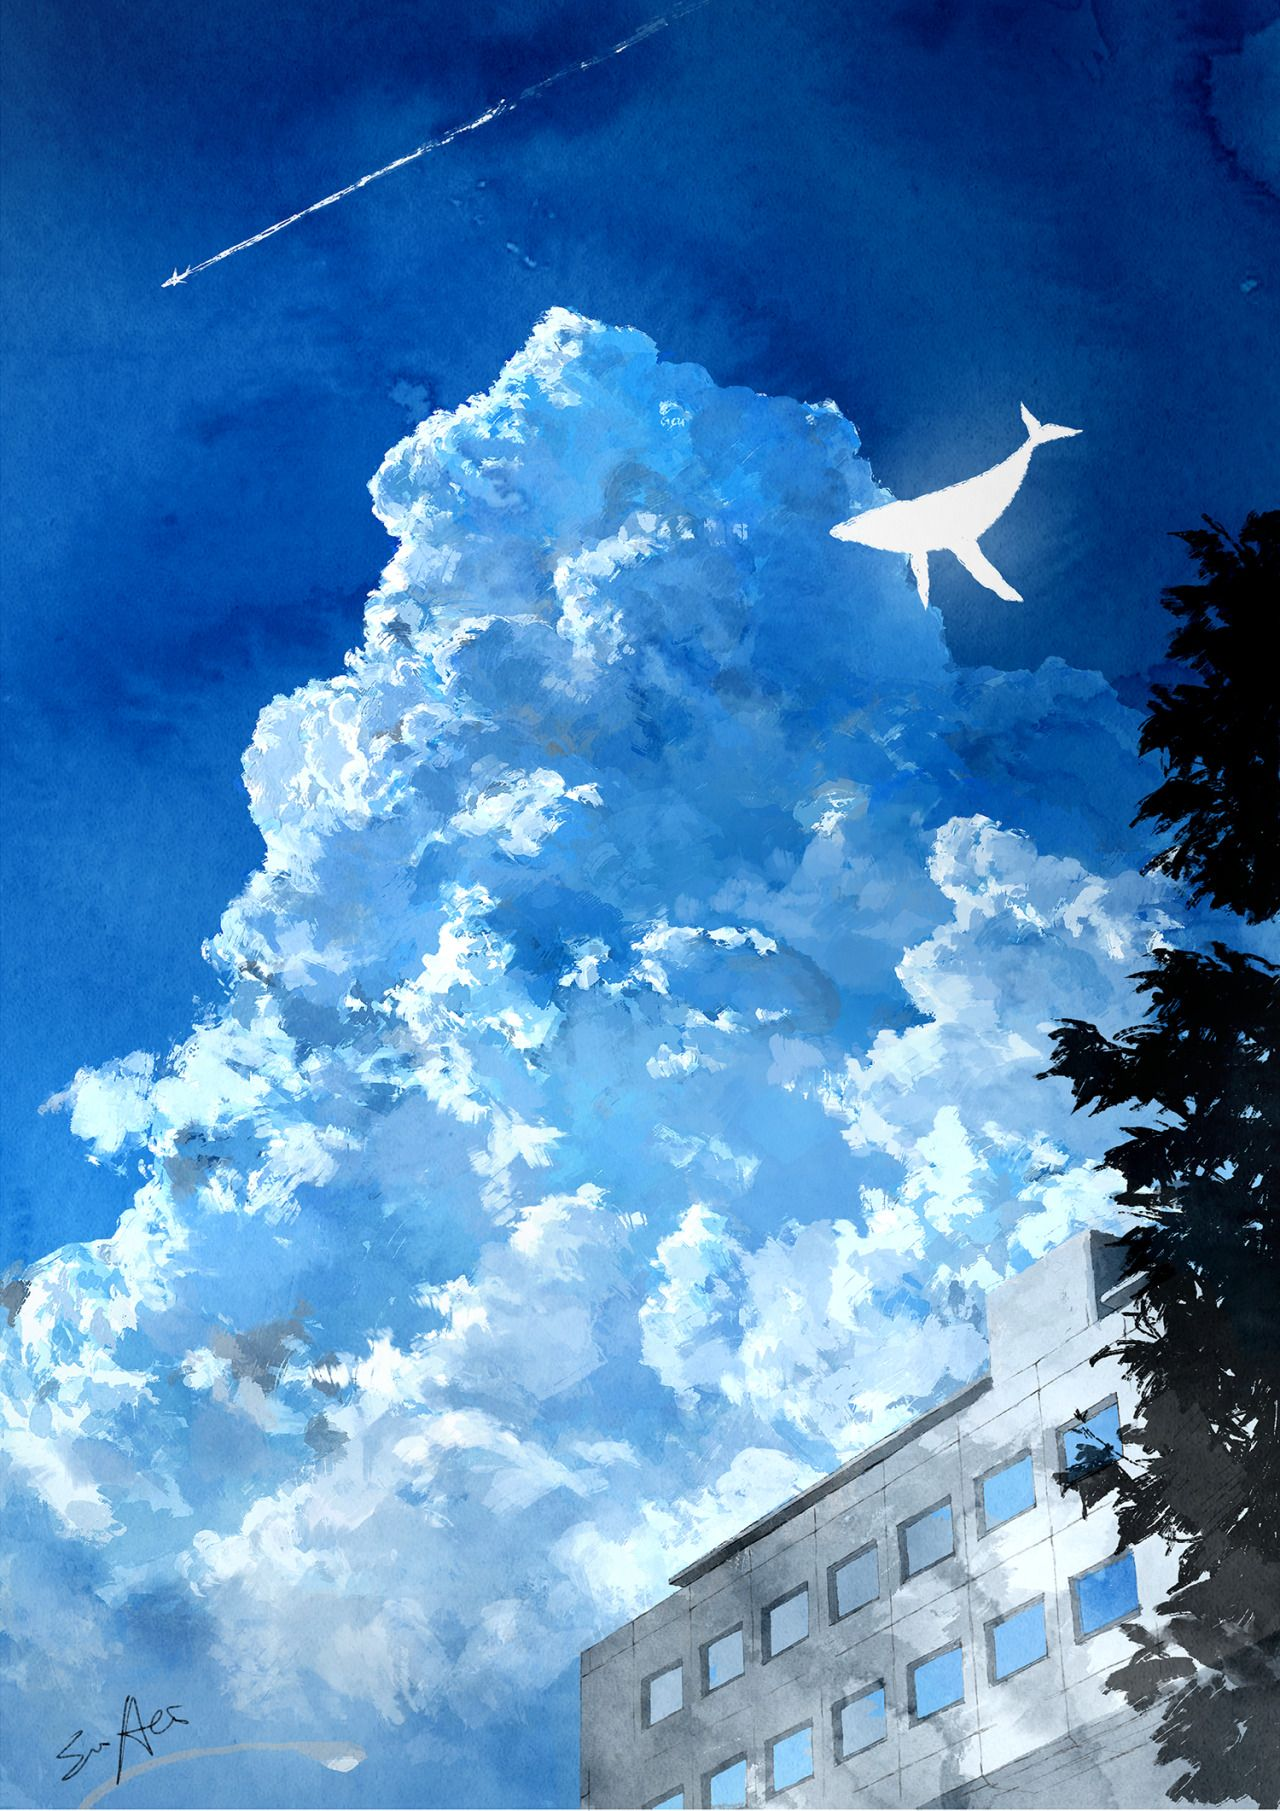 aofuji sui : 画像 | 綺麗 | pinterest | 絵、イラスト、插画